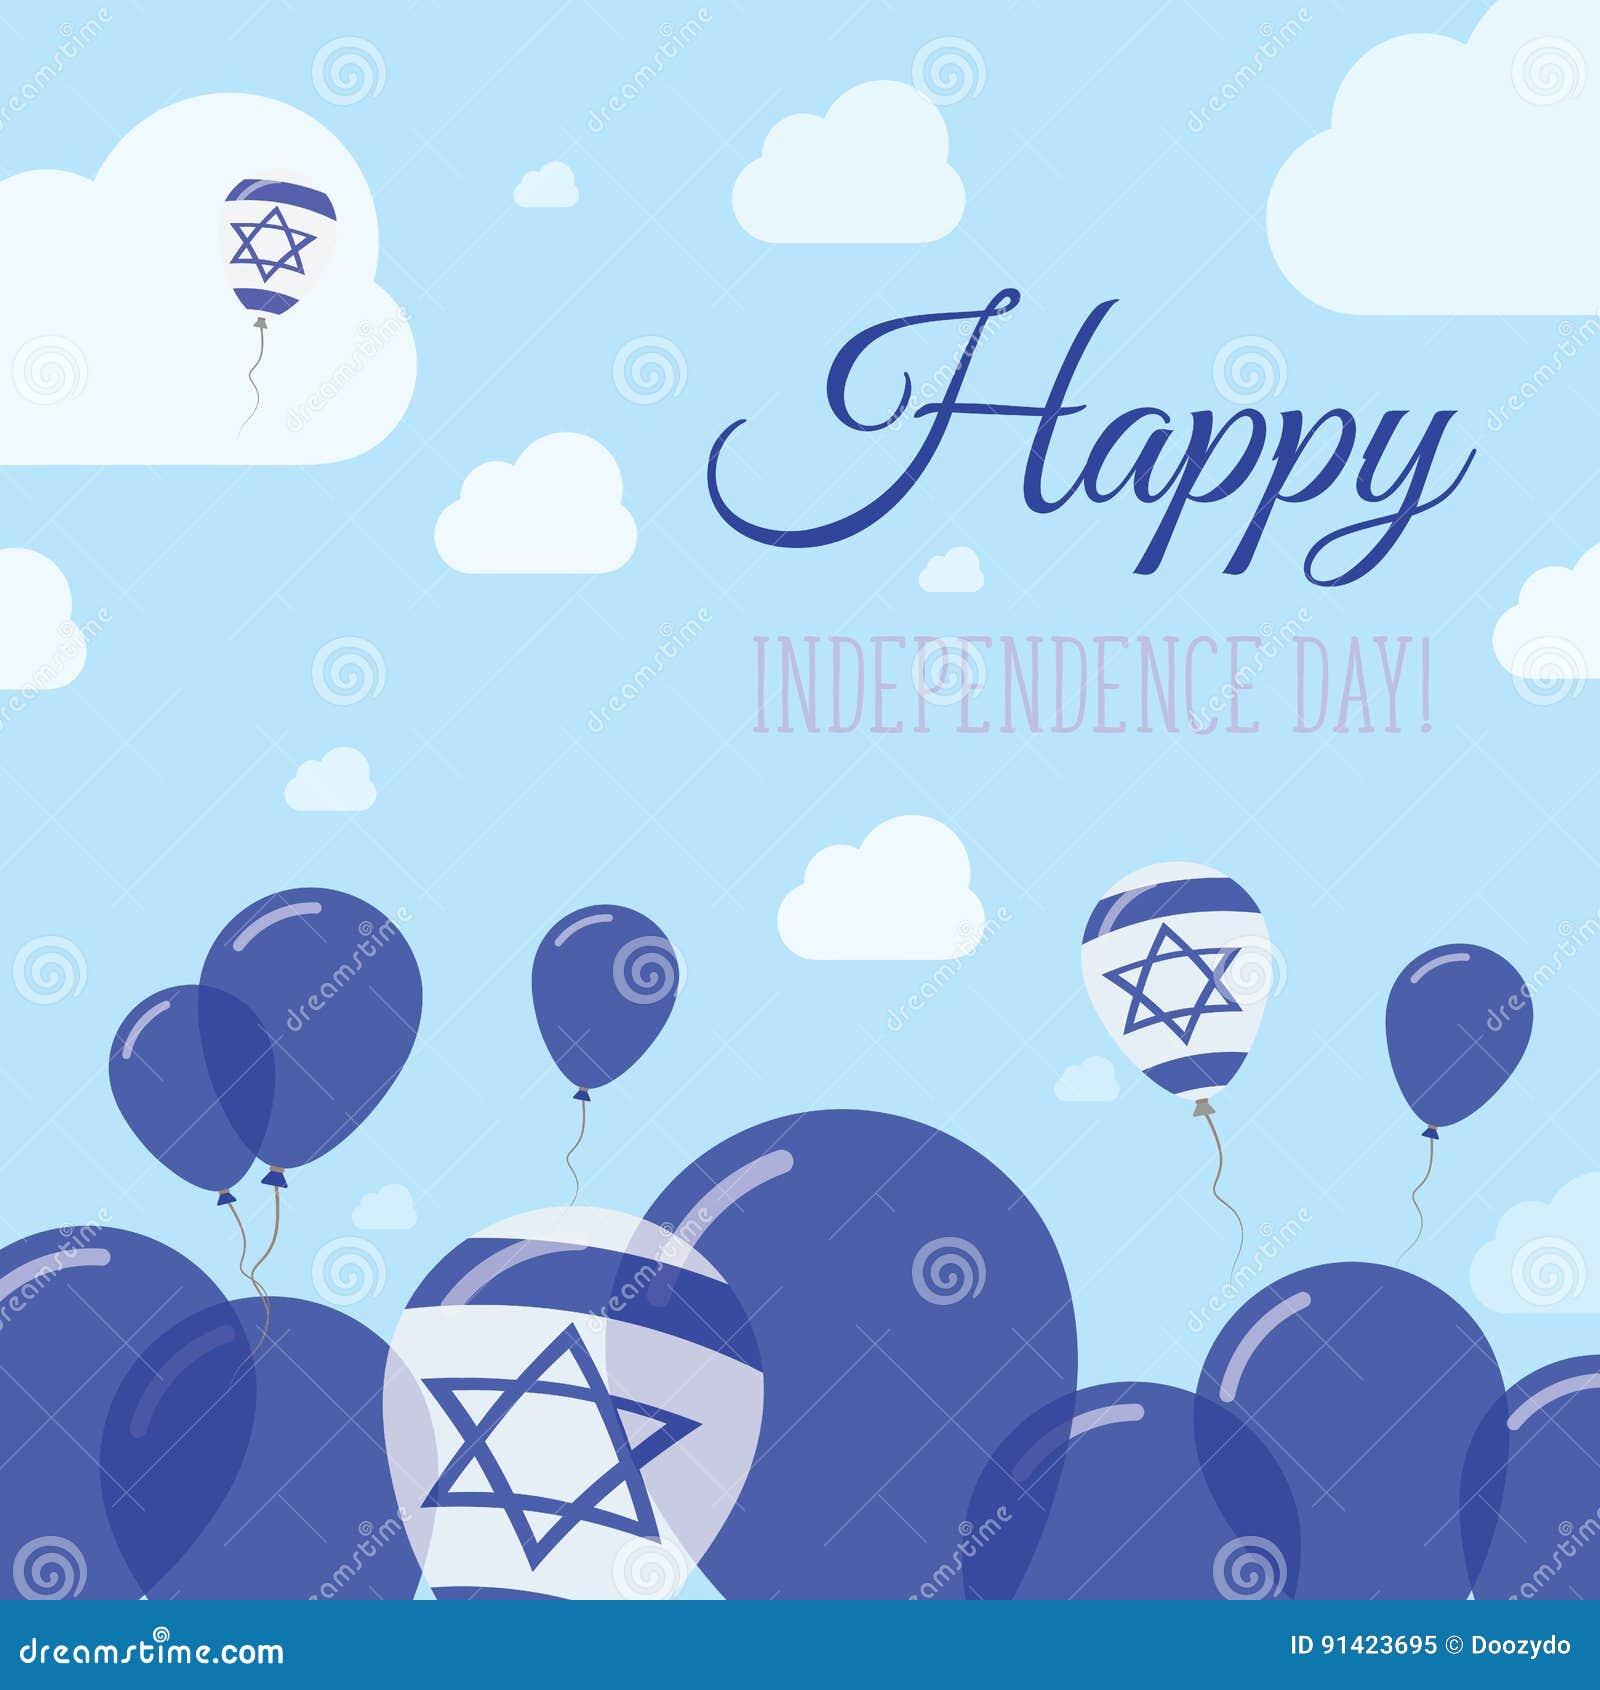 Israel Independence Day Flat Patriotic-Ontwerp